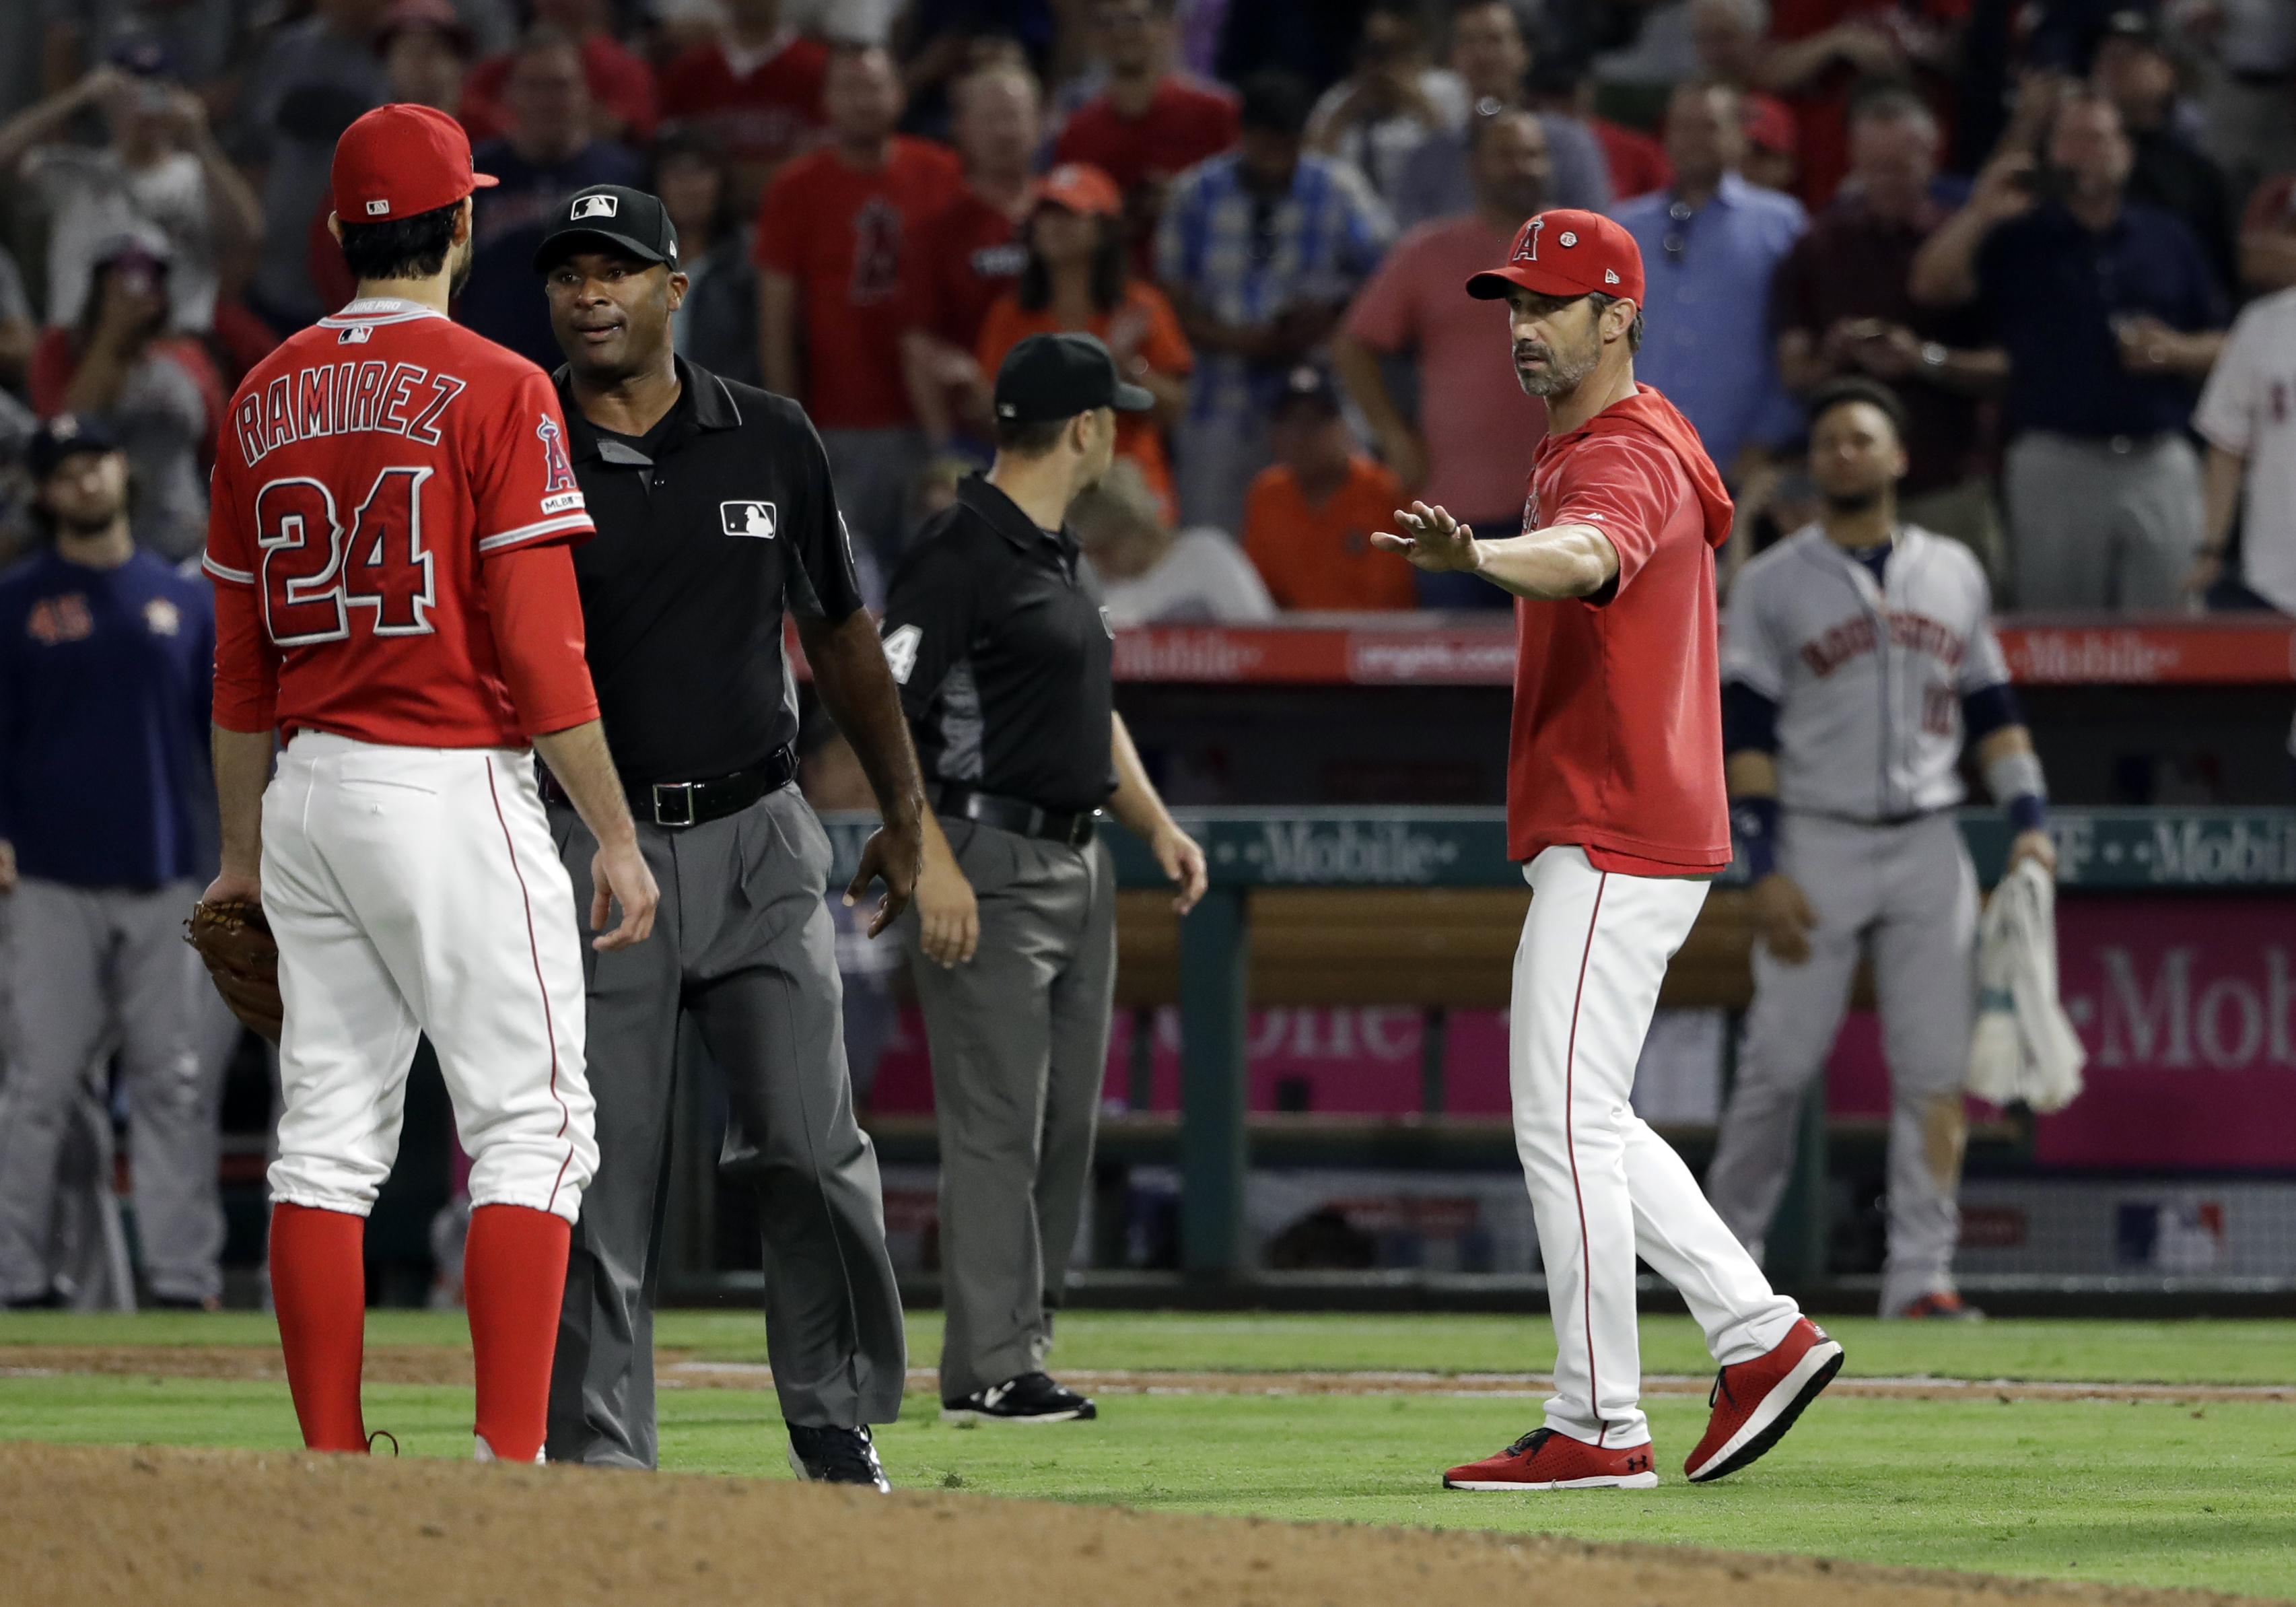 Angels pitcher Noé Ramirez suspended for 3 games